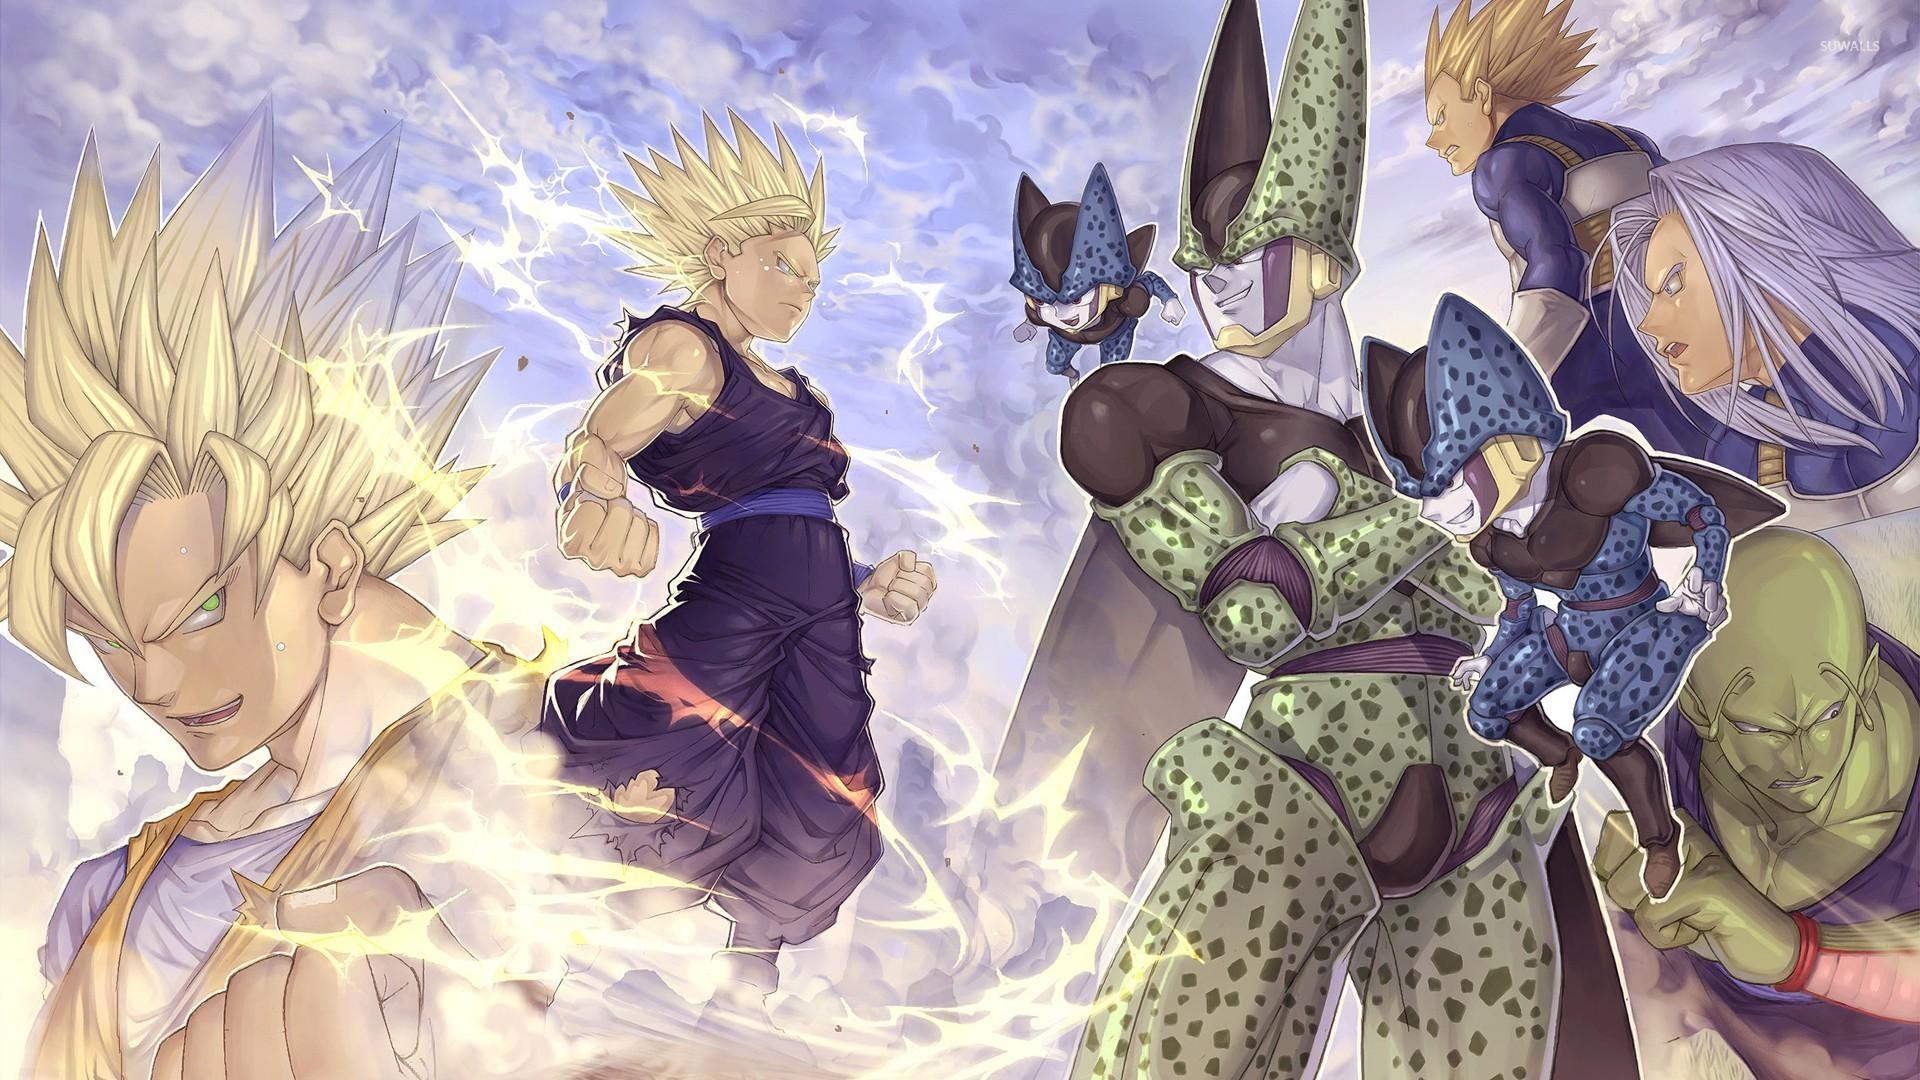 Dragon Ball Z 10 Wallpaper Anime Wallpapers 41719